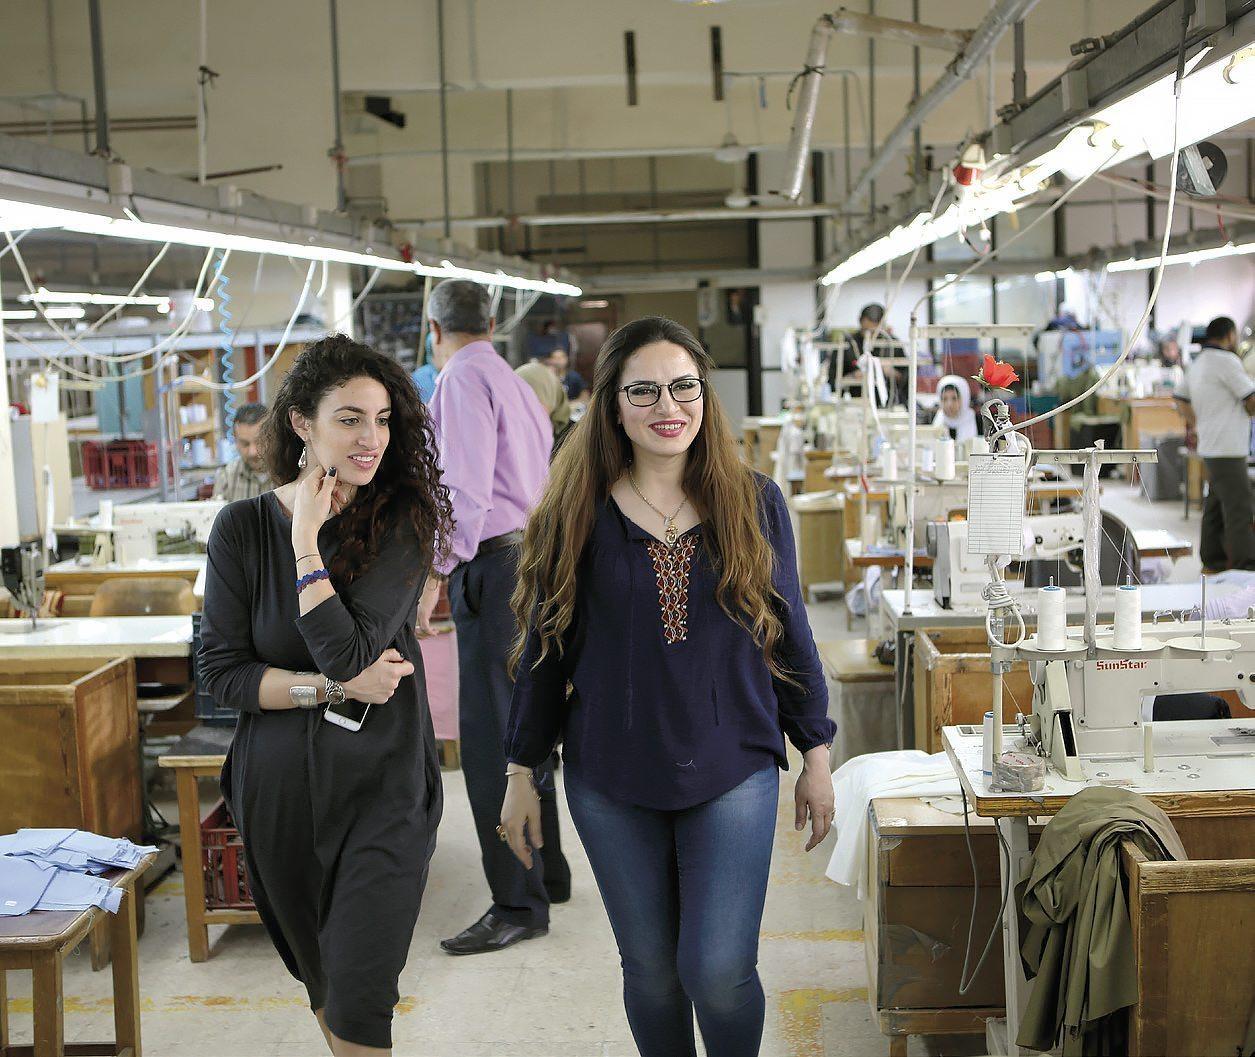 Women Entrepreneurs From The Mediterranean Region Meet To